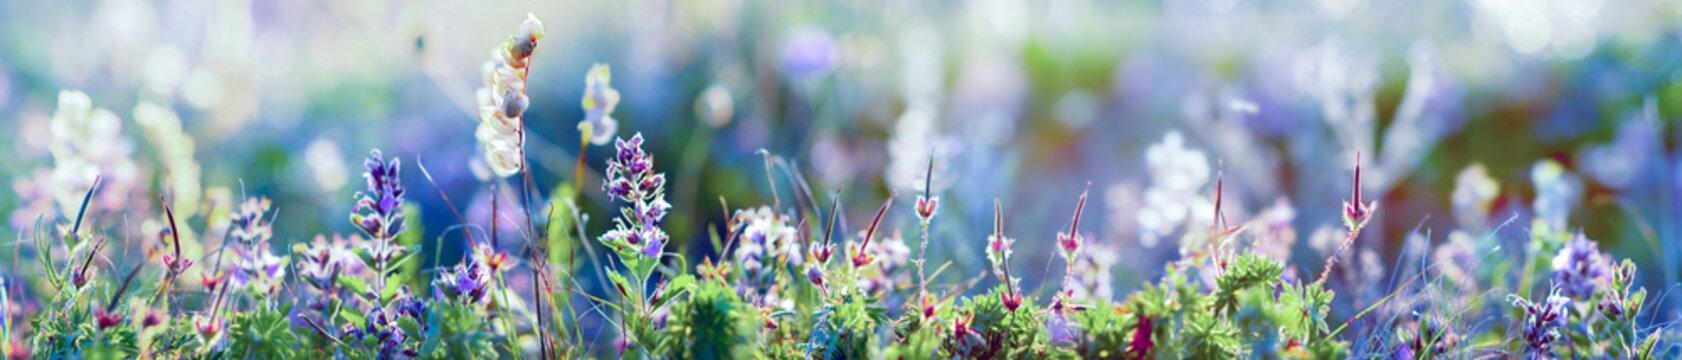 wild flowers and grass closeup, horizontal panorama photo